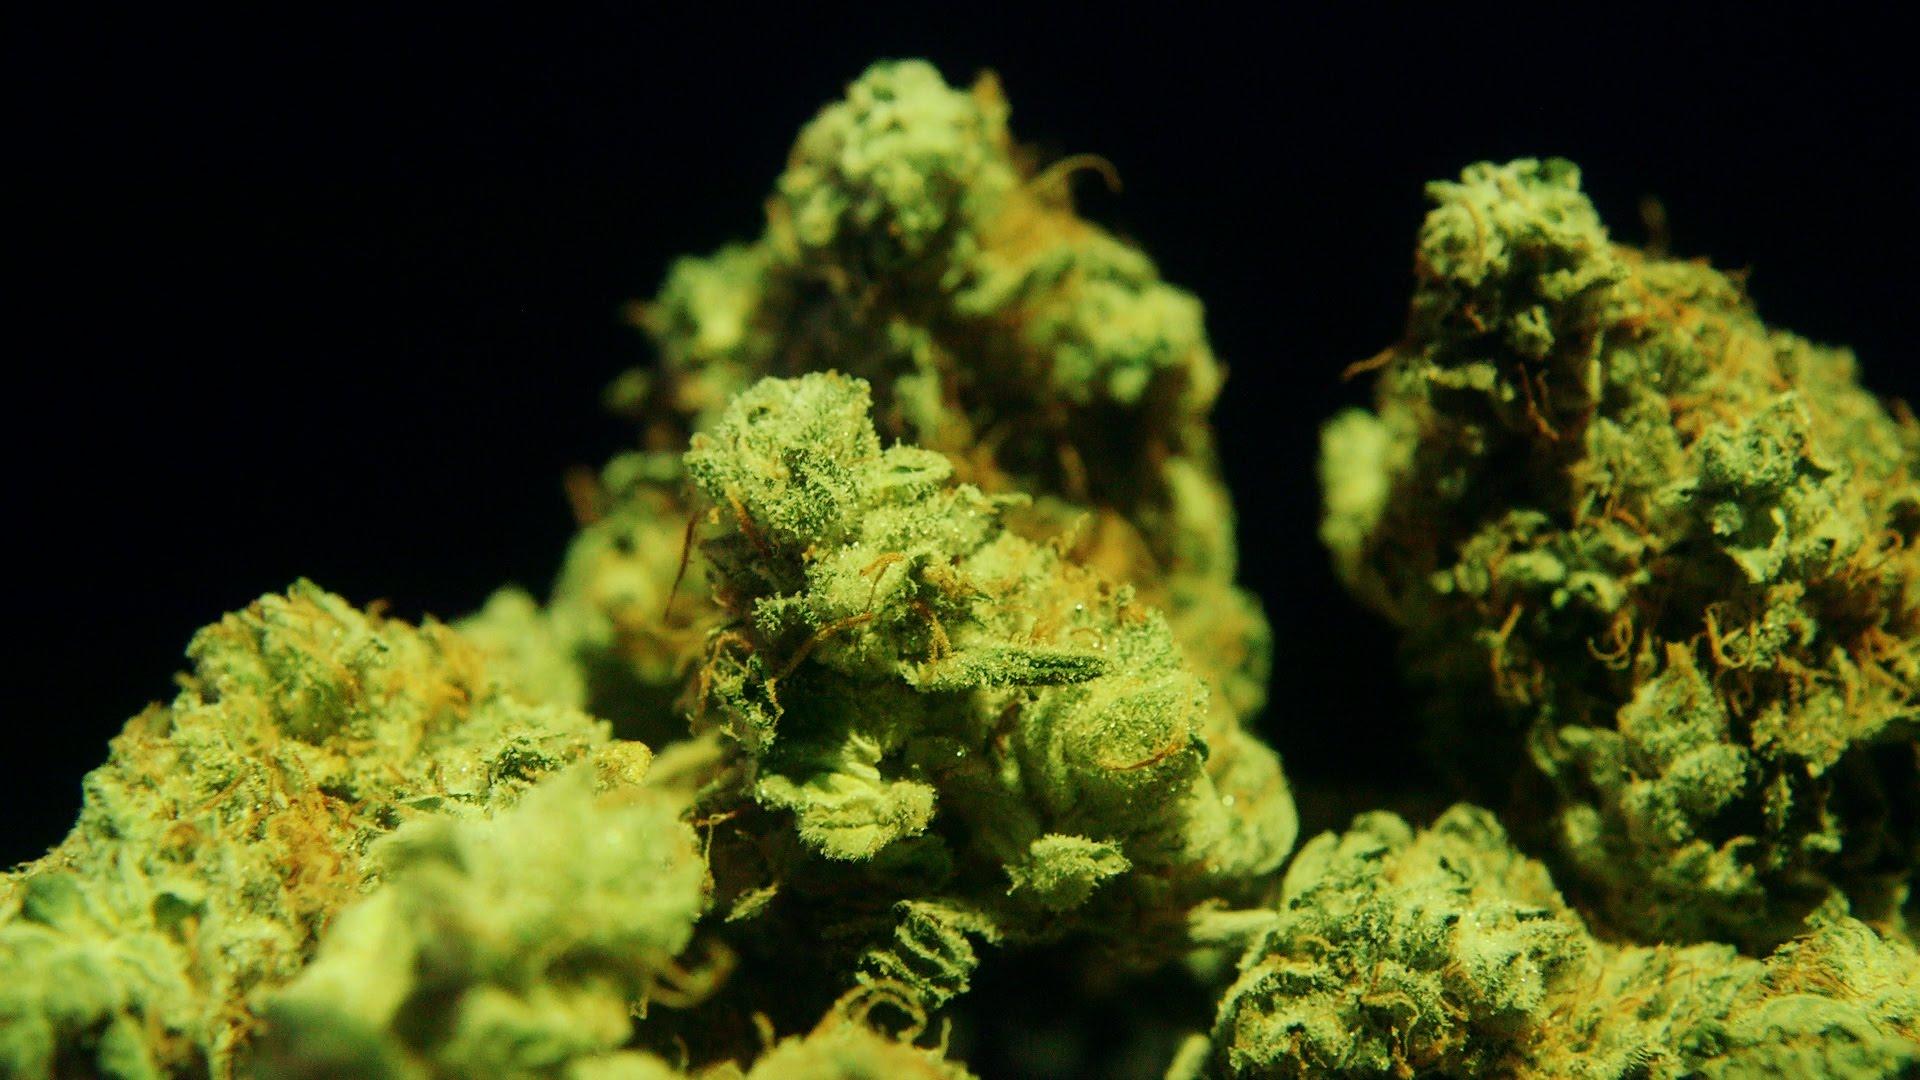 Cannabis Up Close #4: Gorilla Glue Number 4 (Hybrid) – Strain Review